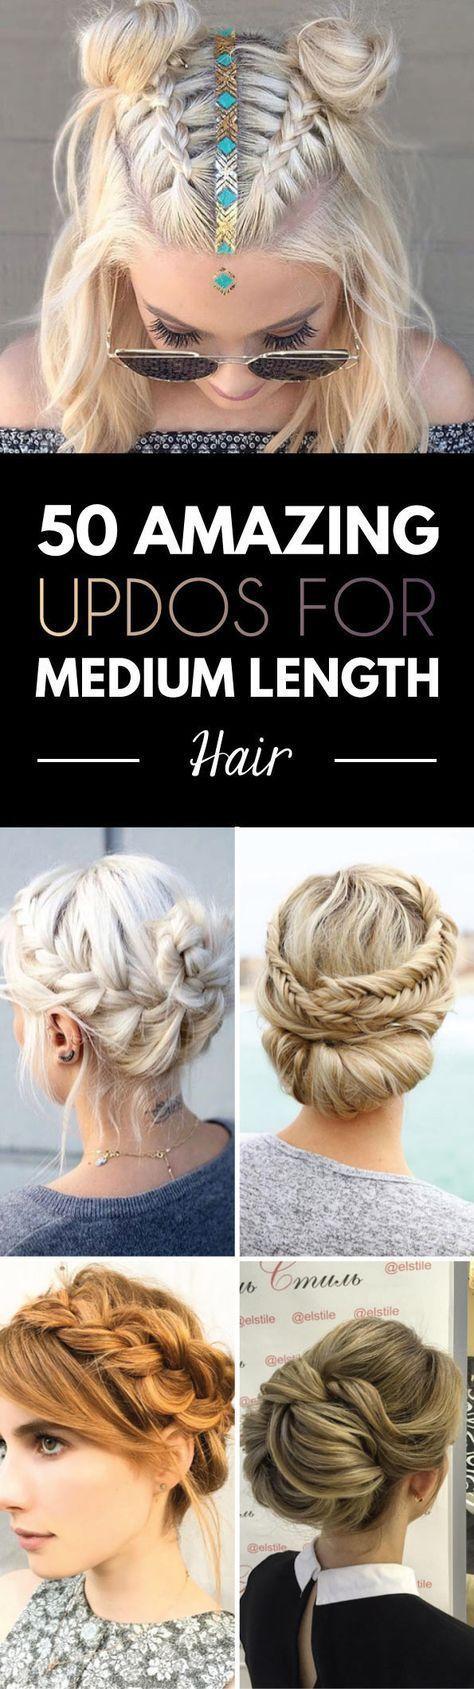 best merida images on pinterest cute hairstyles hairstyle